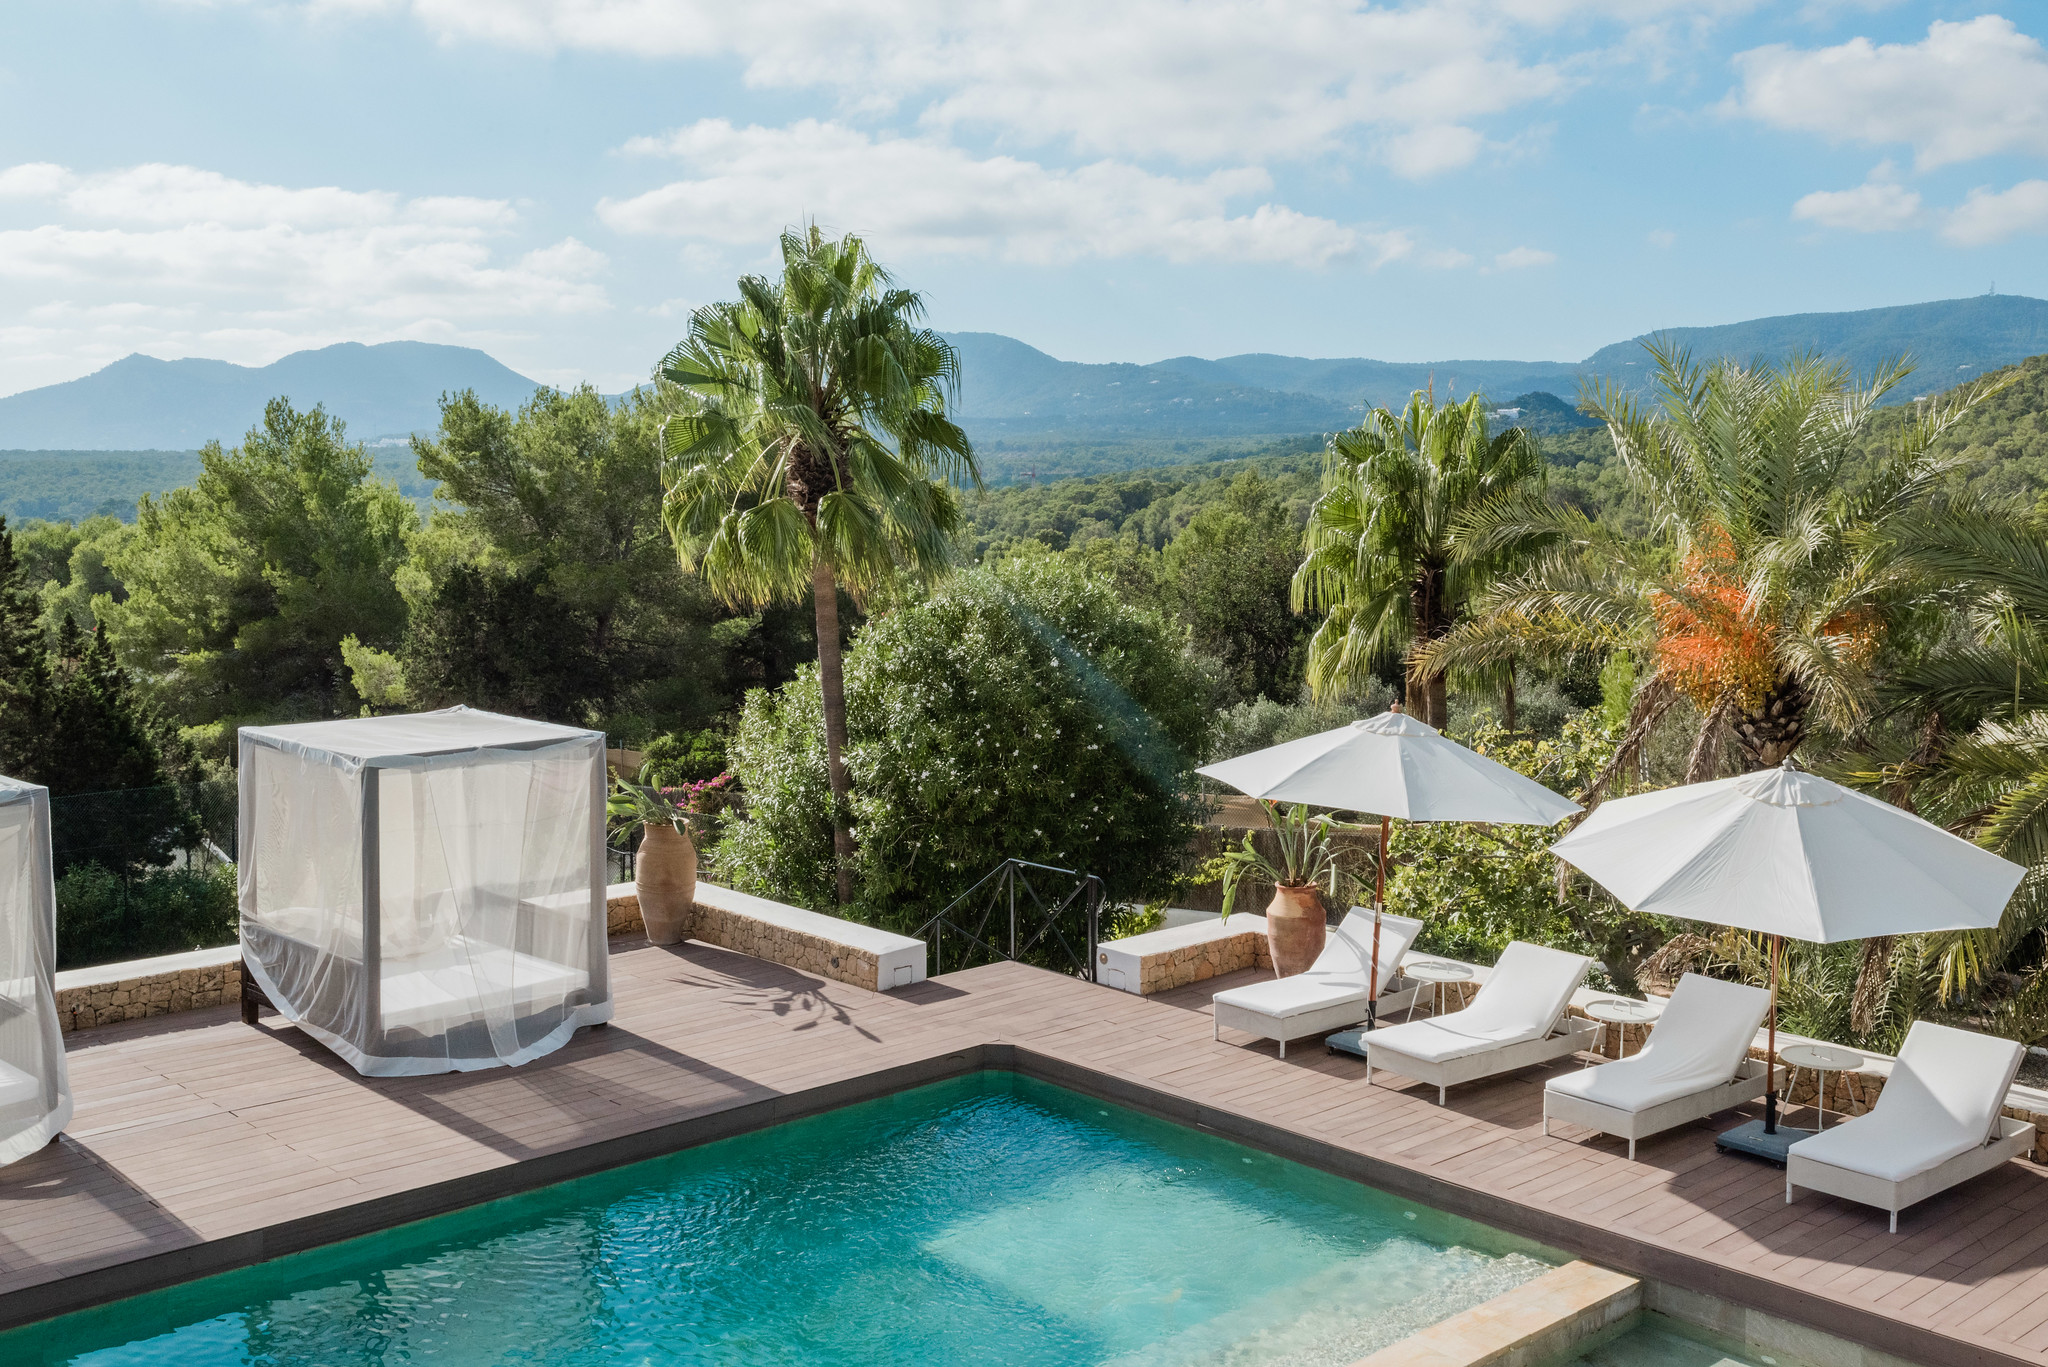 https://www.white-ibiza.com/wp-content/uploads/2020/05/white-ibiza-villas-casa-amalia-exterior-views.jpg